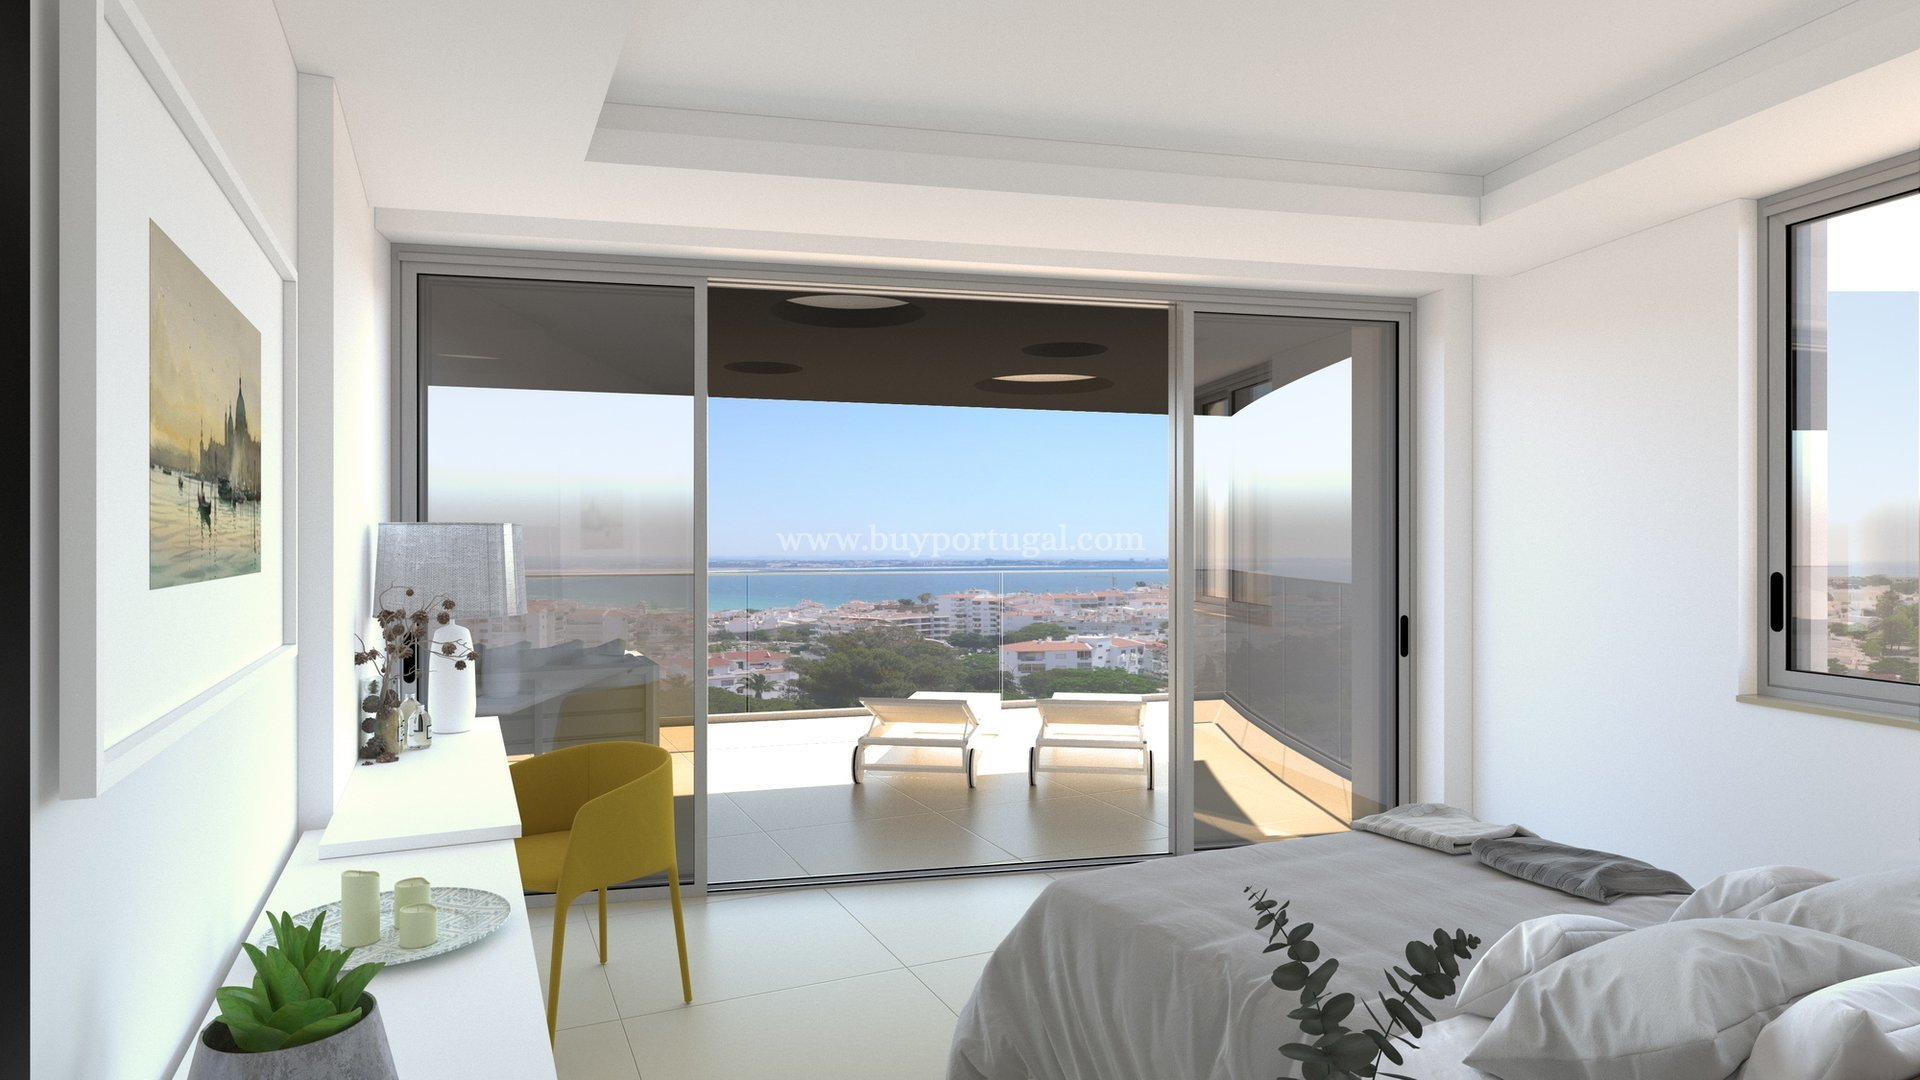 3 Bedroom Apartment Lagos, Western Algarve Ref: GA214C